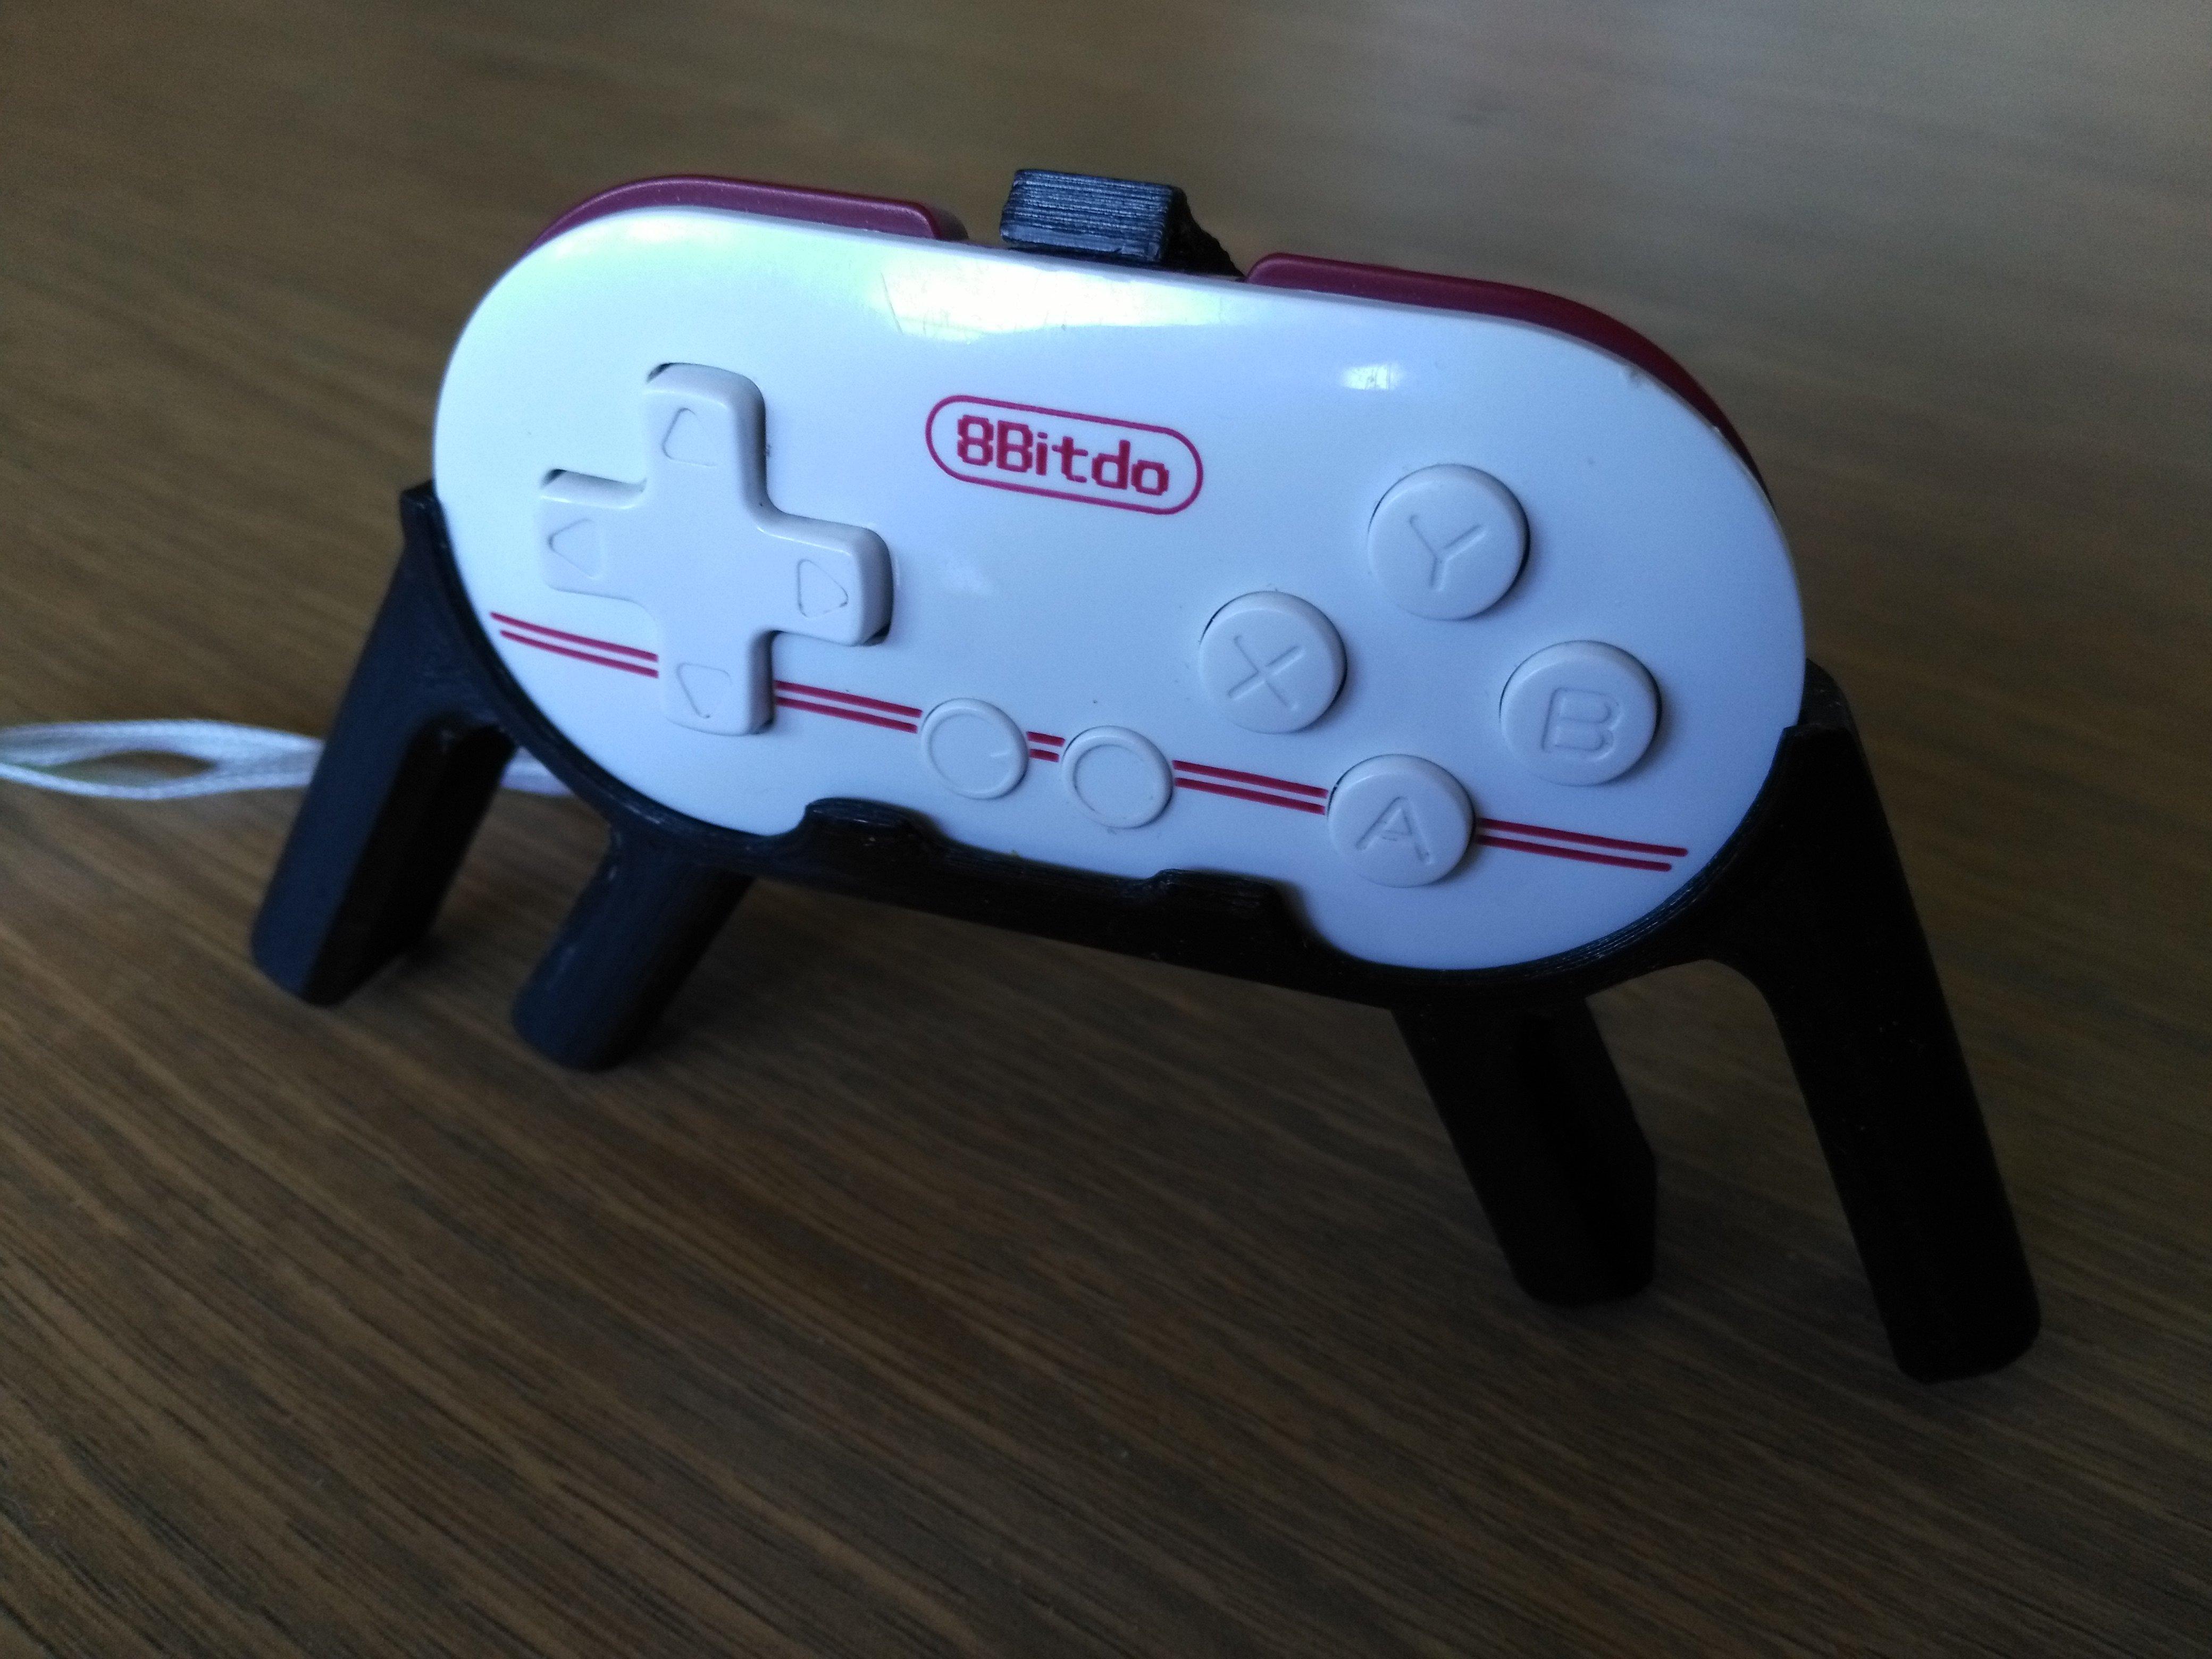 8bitdo ZERO gamepad handles